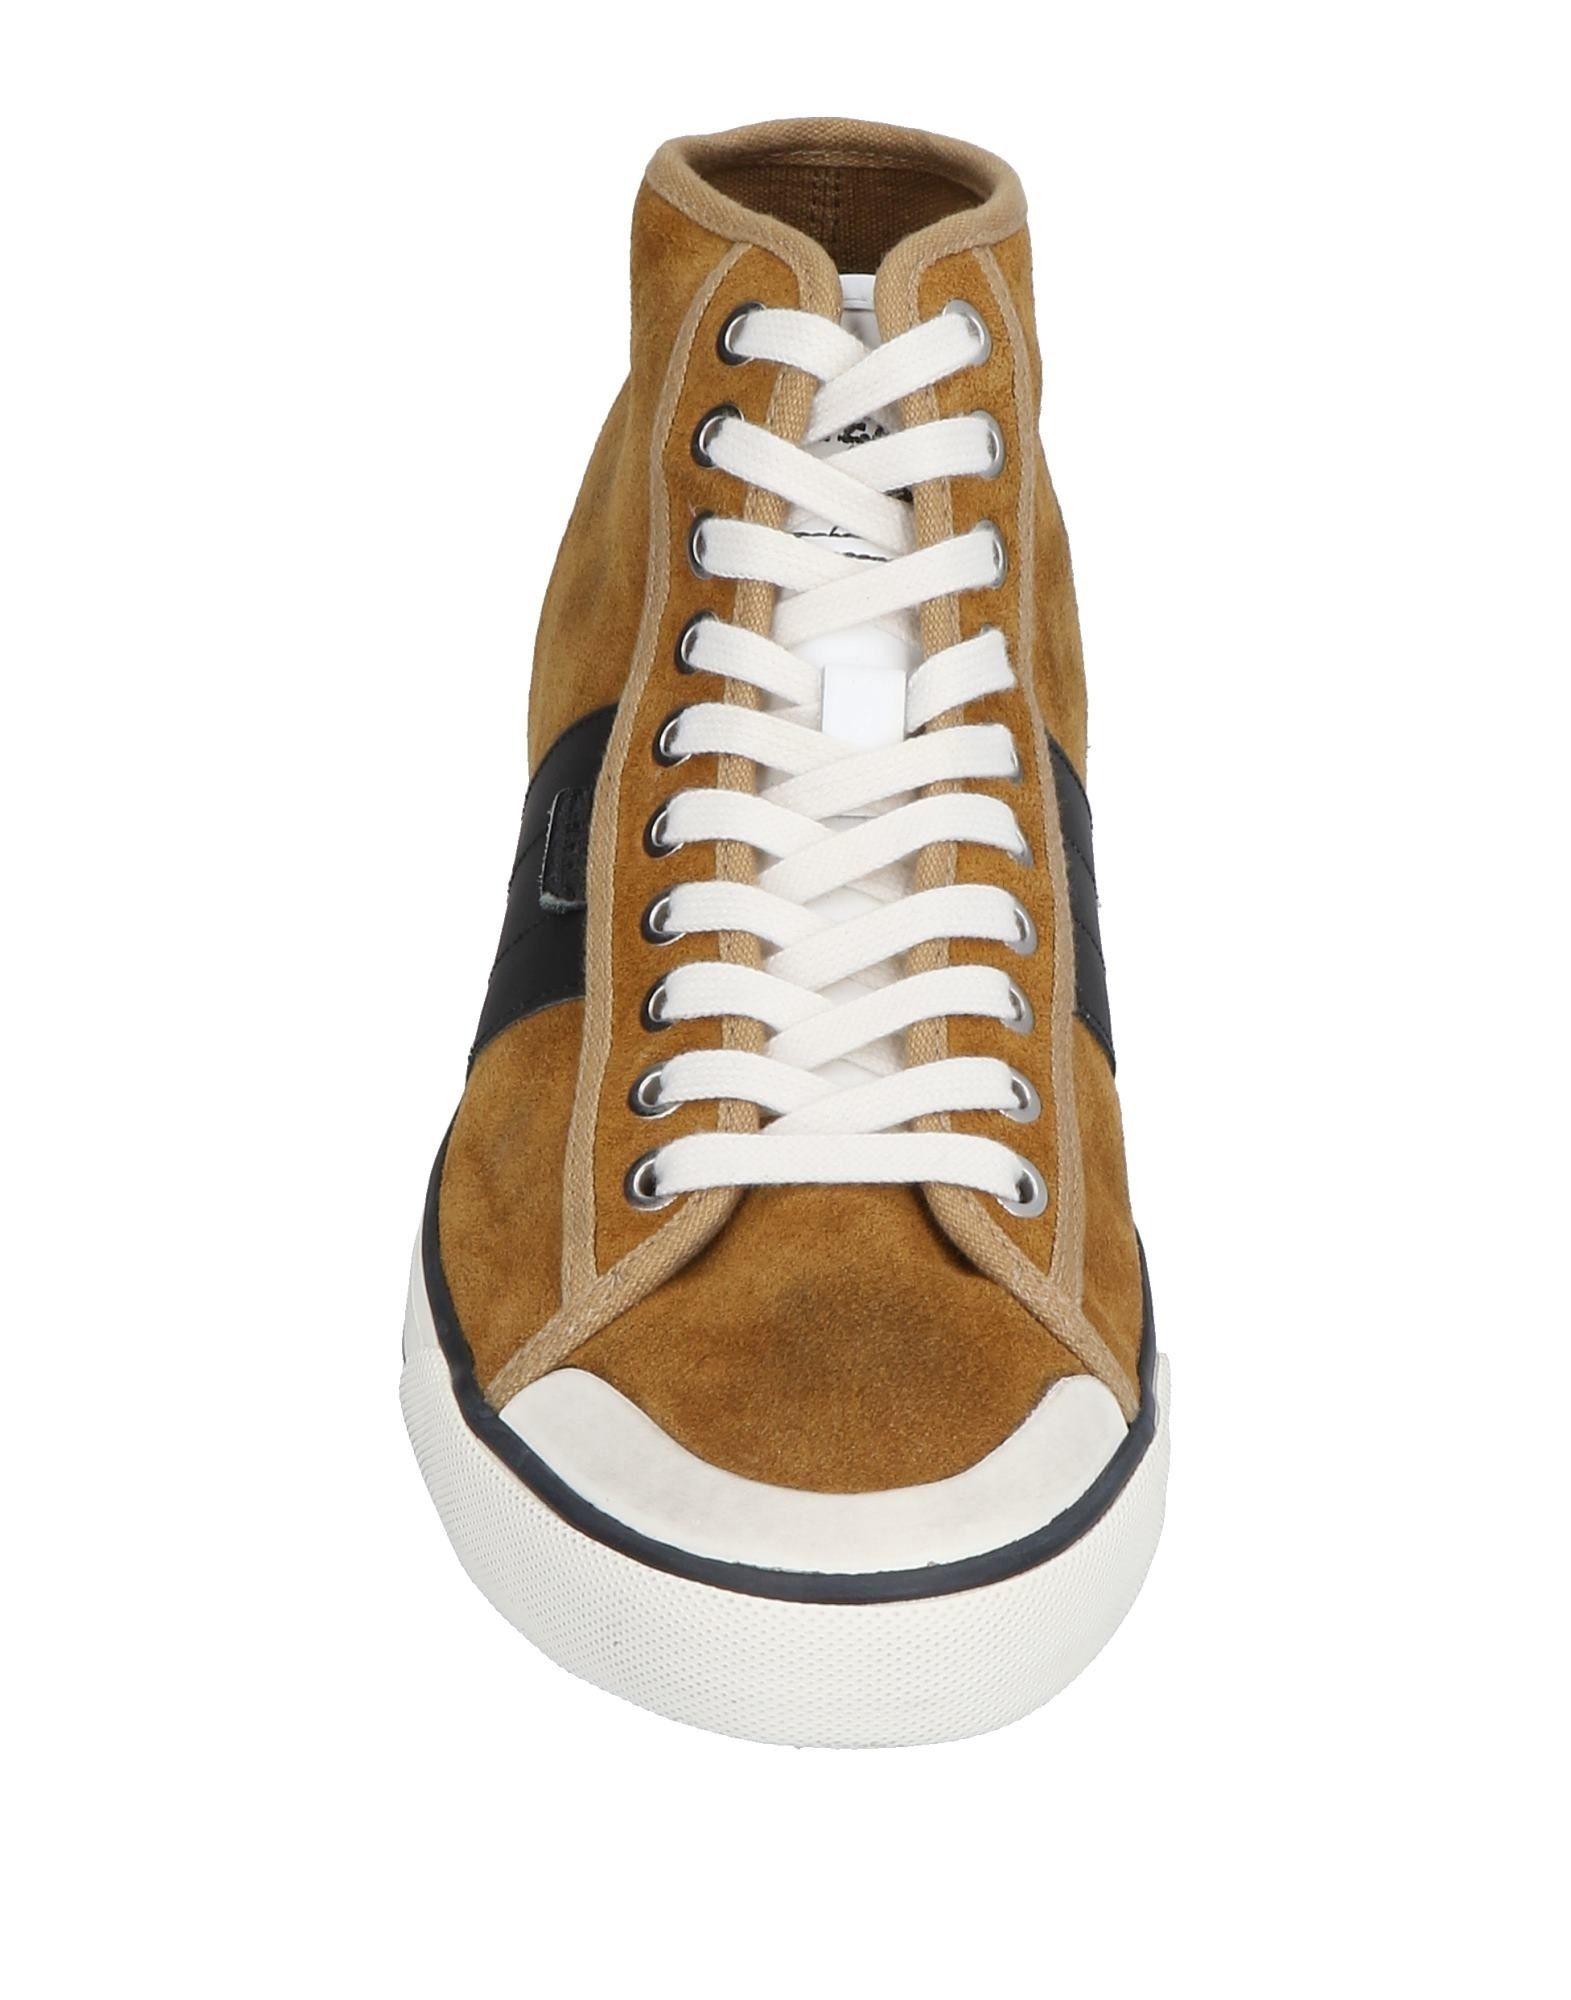 Rabatt echte Schuhe D.A.T.E. Sneakers Herren  11491161OI